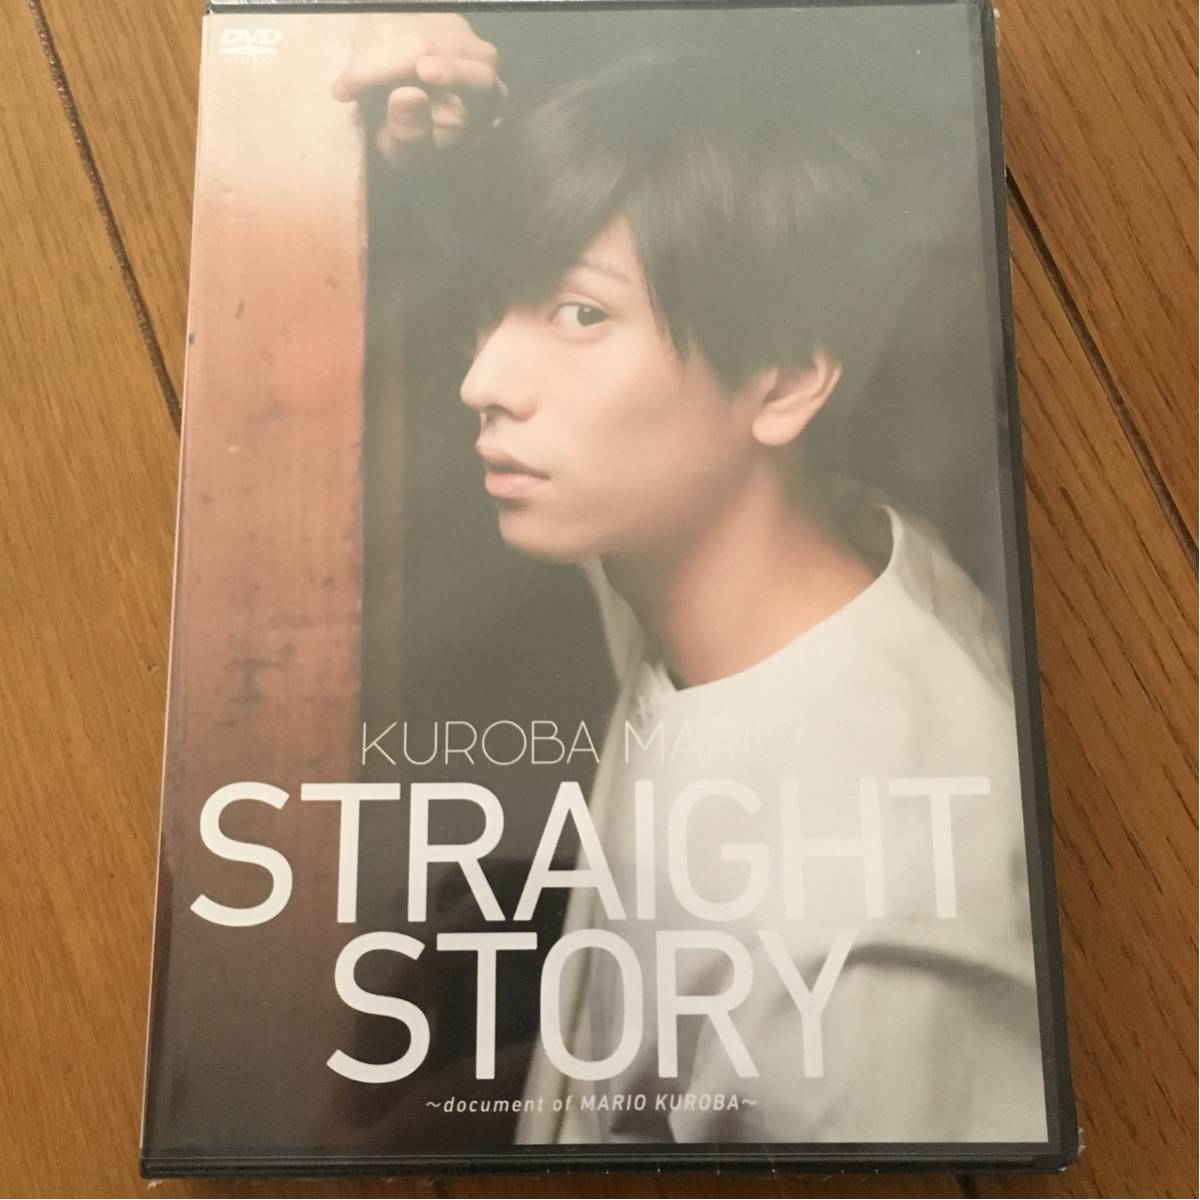 黒羽麻璃央 DVD STRAIGHT STORY ~ document of MARIO KUROBA ~ 新品 未開封